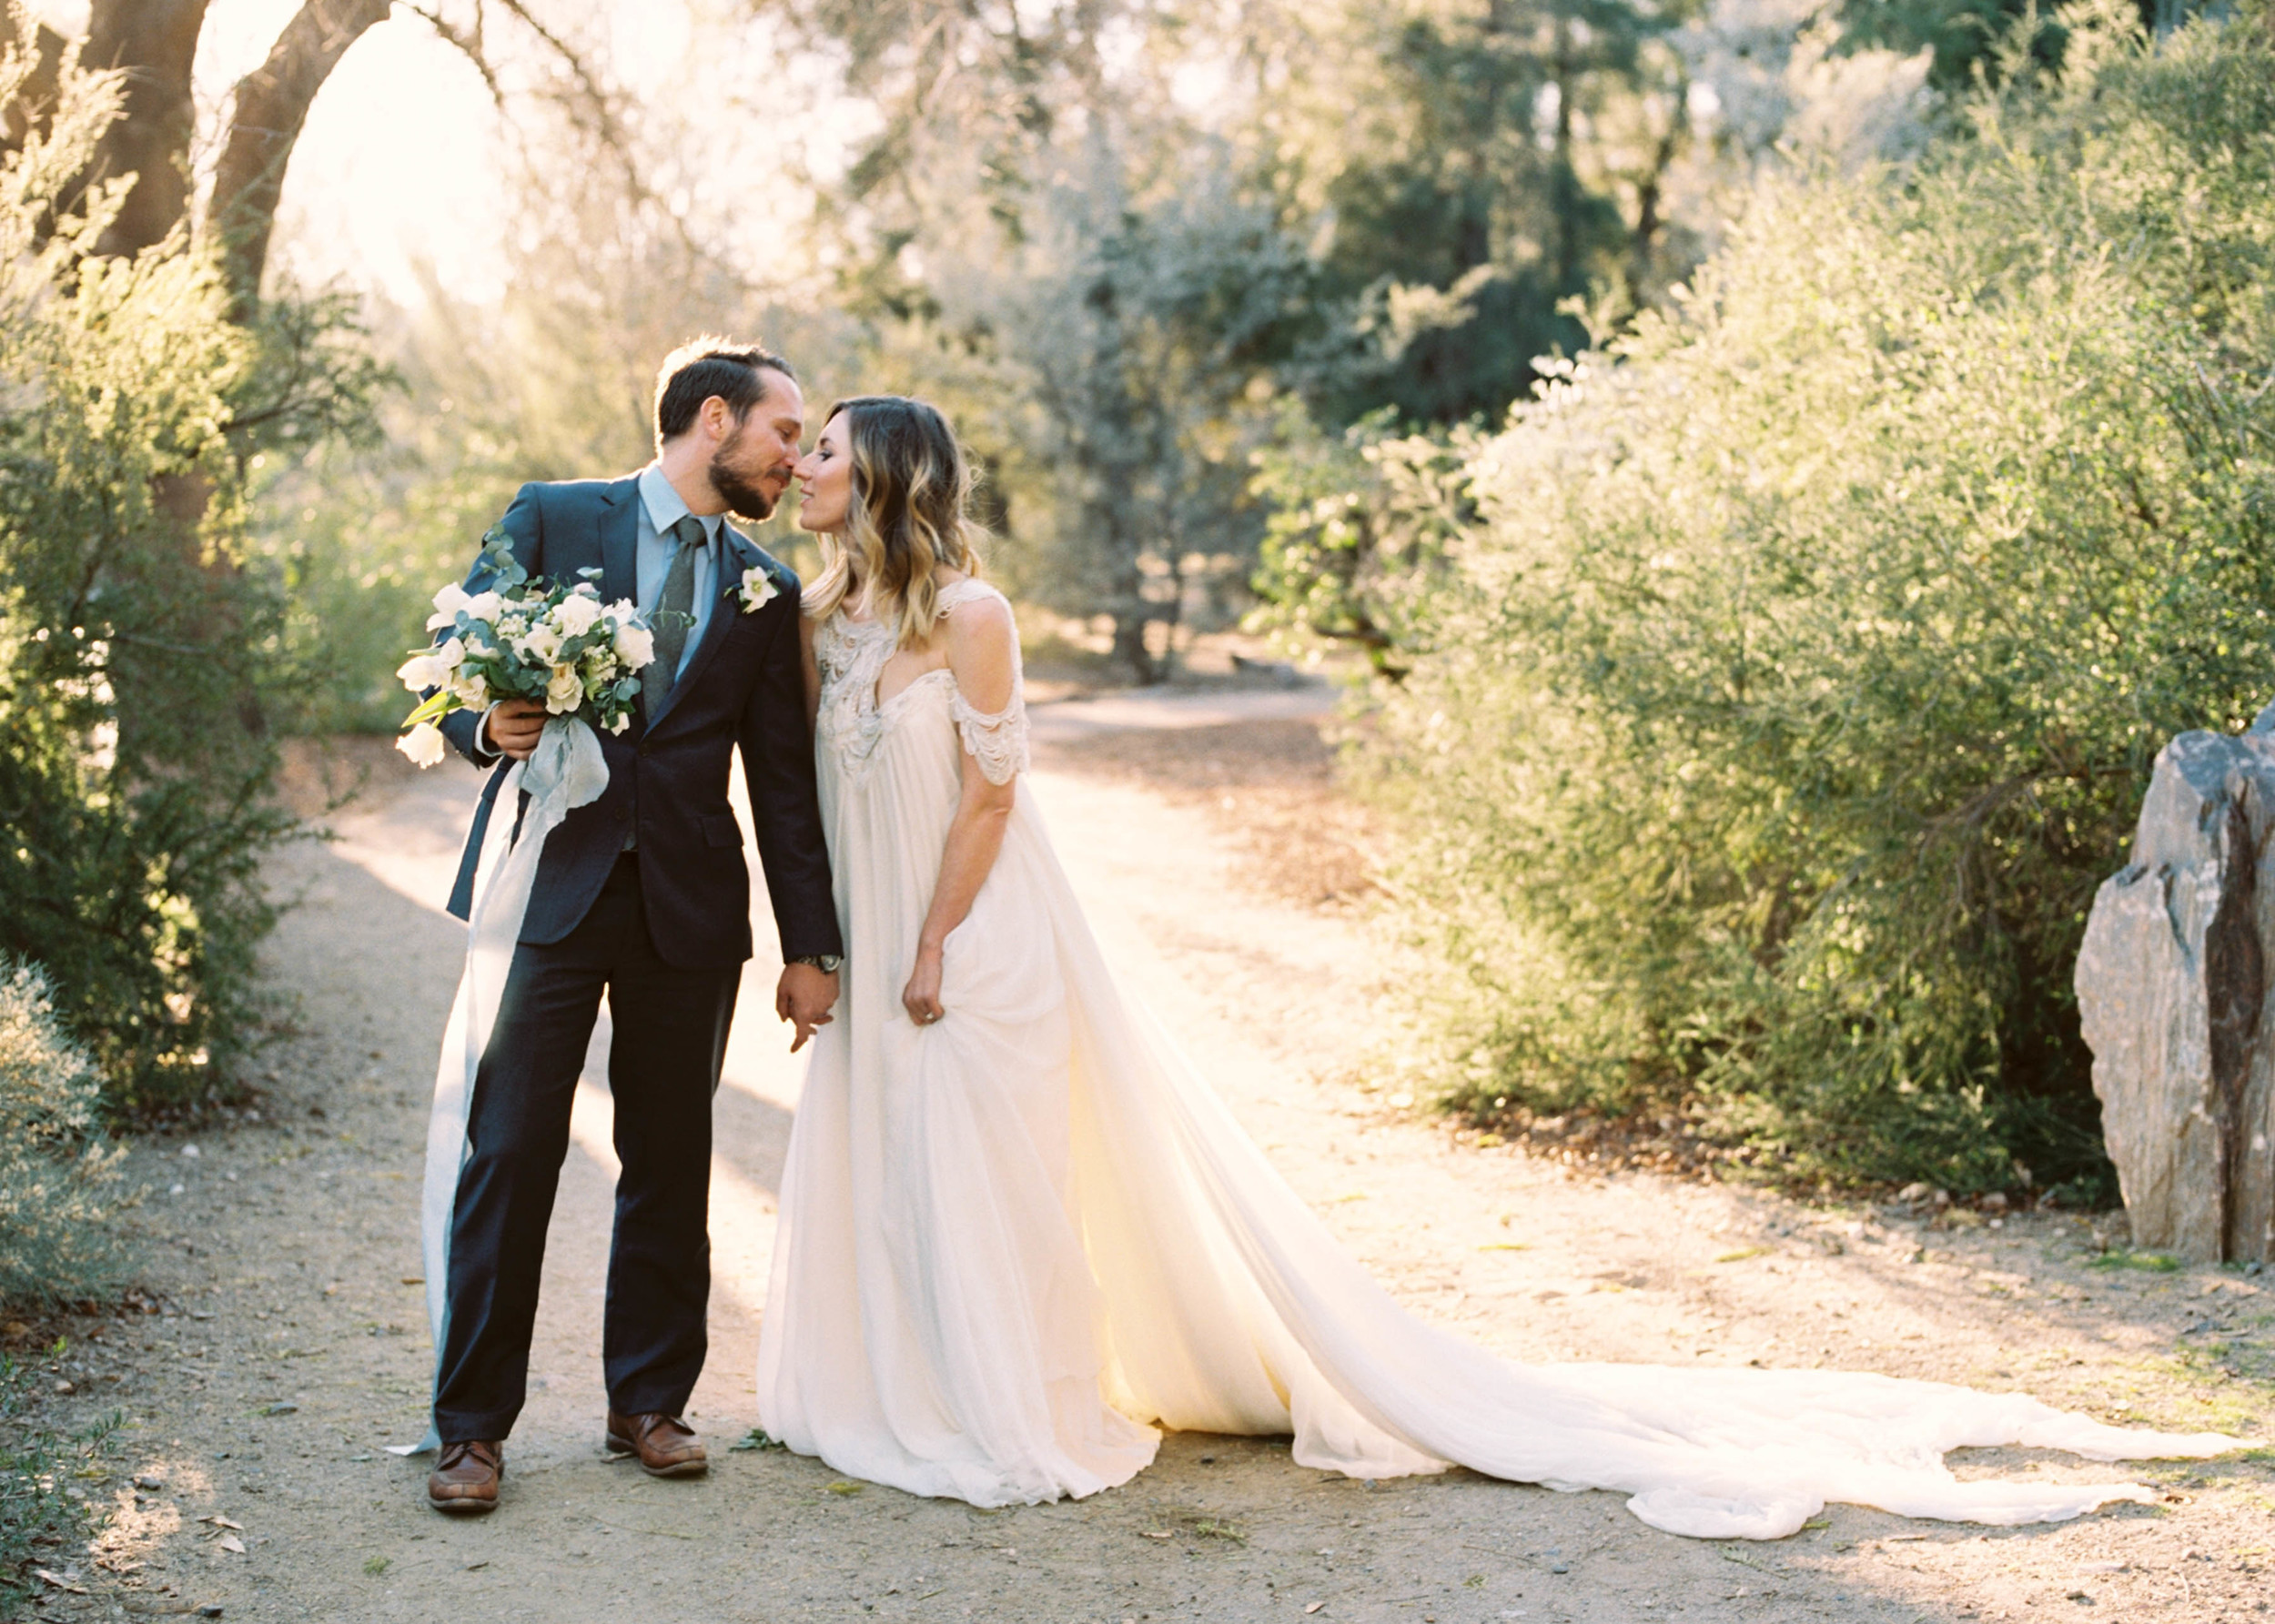 Danford-Photography-Bozeman-Big Sky-Glacier-Fine Art Film-Wedding-Engagement-Photographers-09.jpg